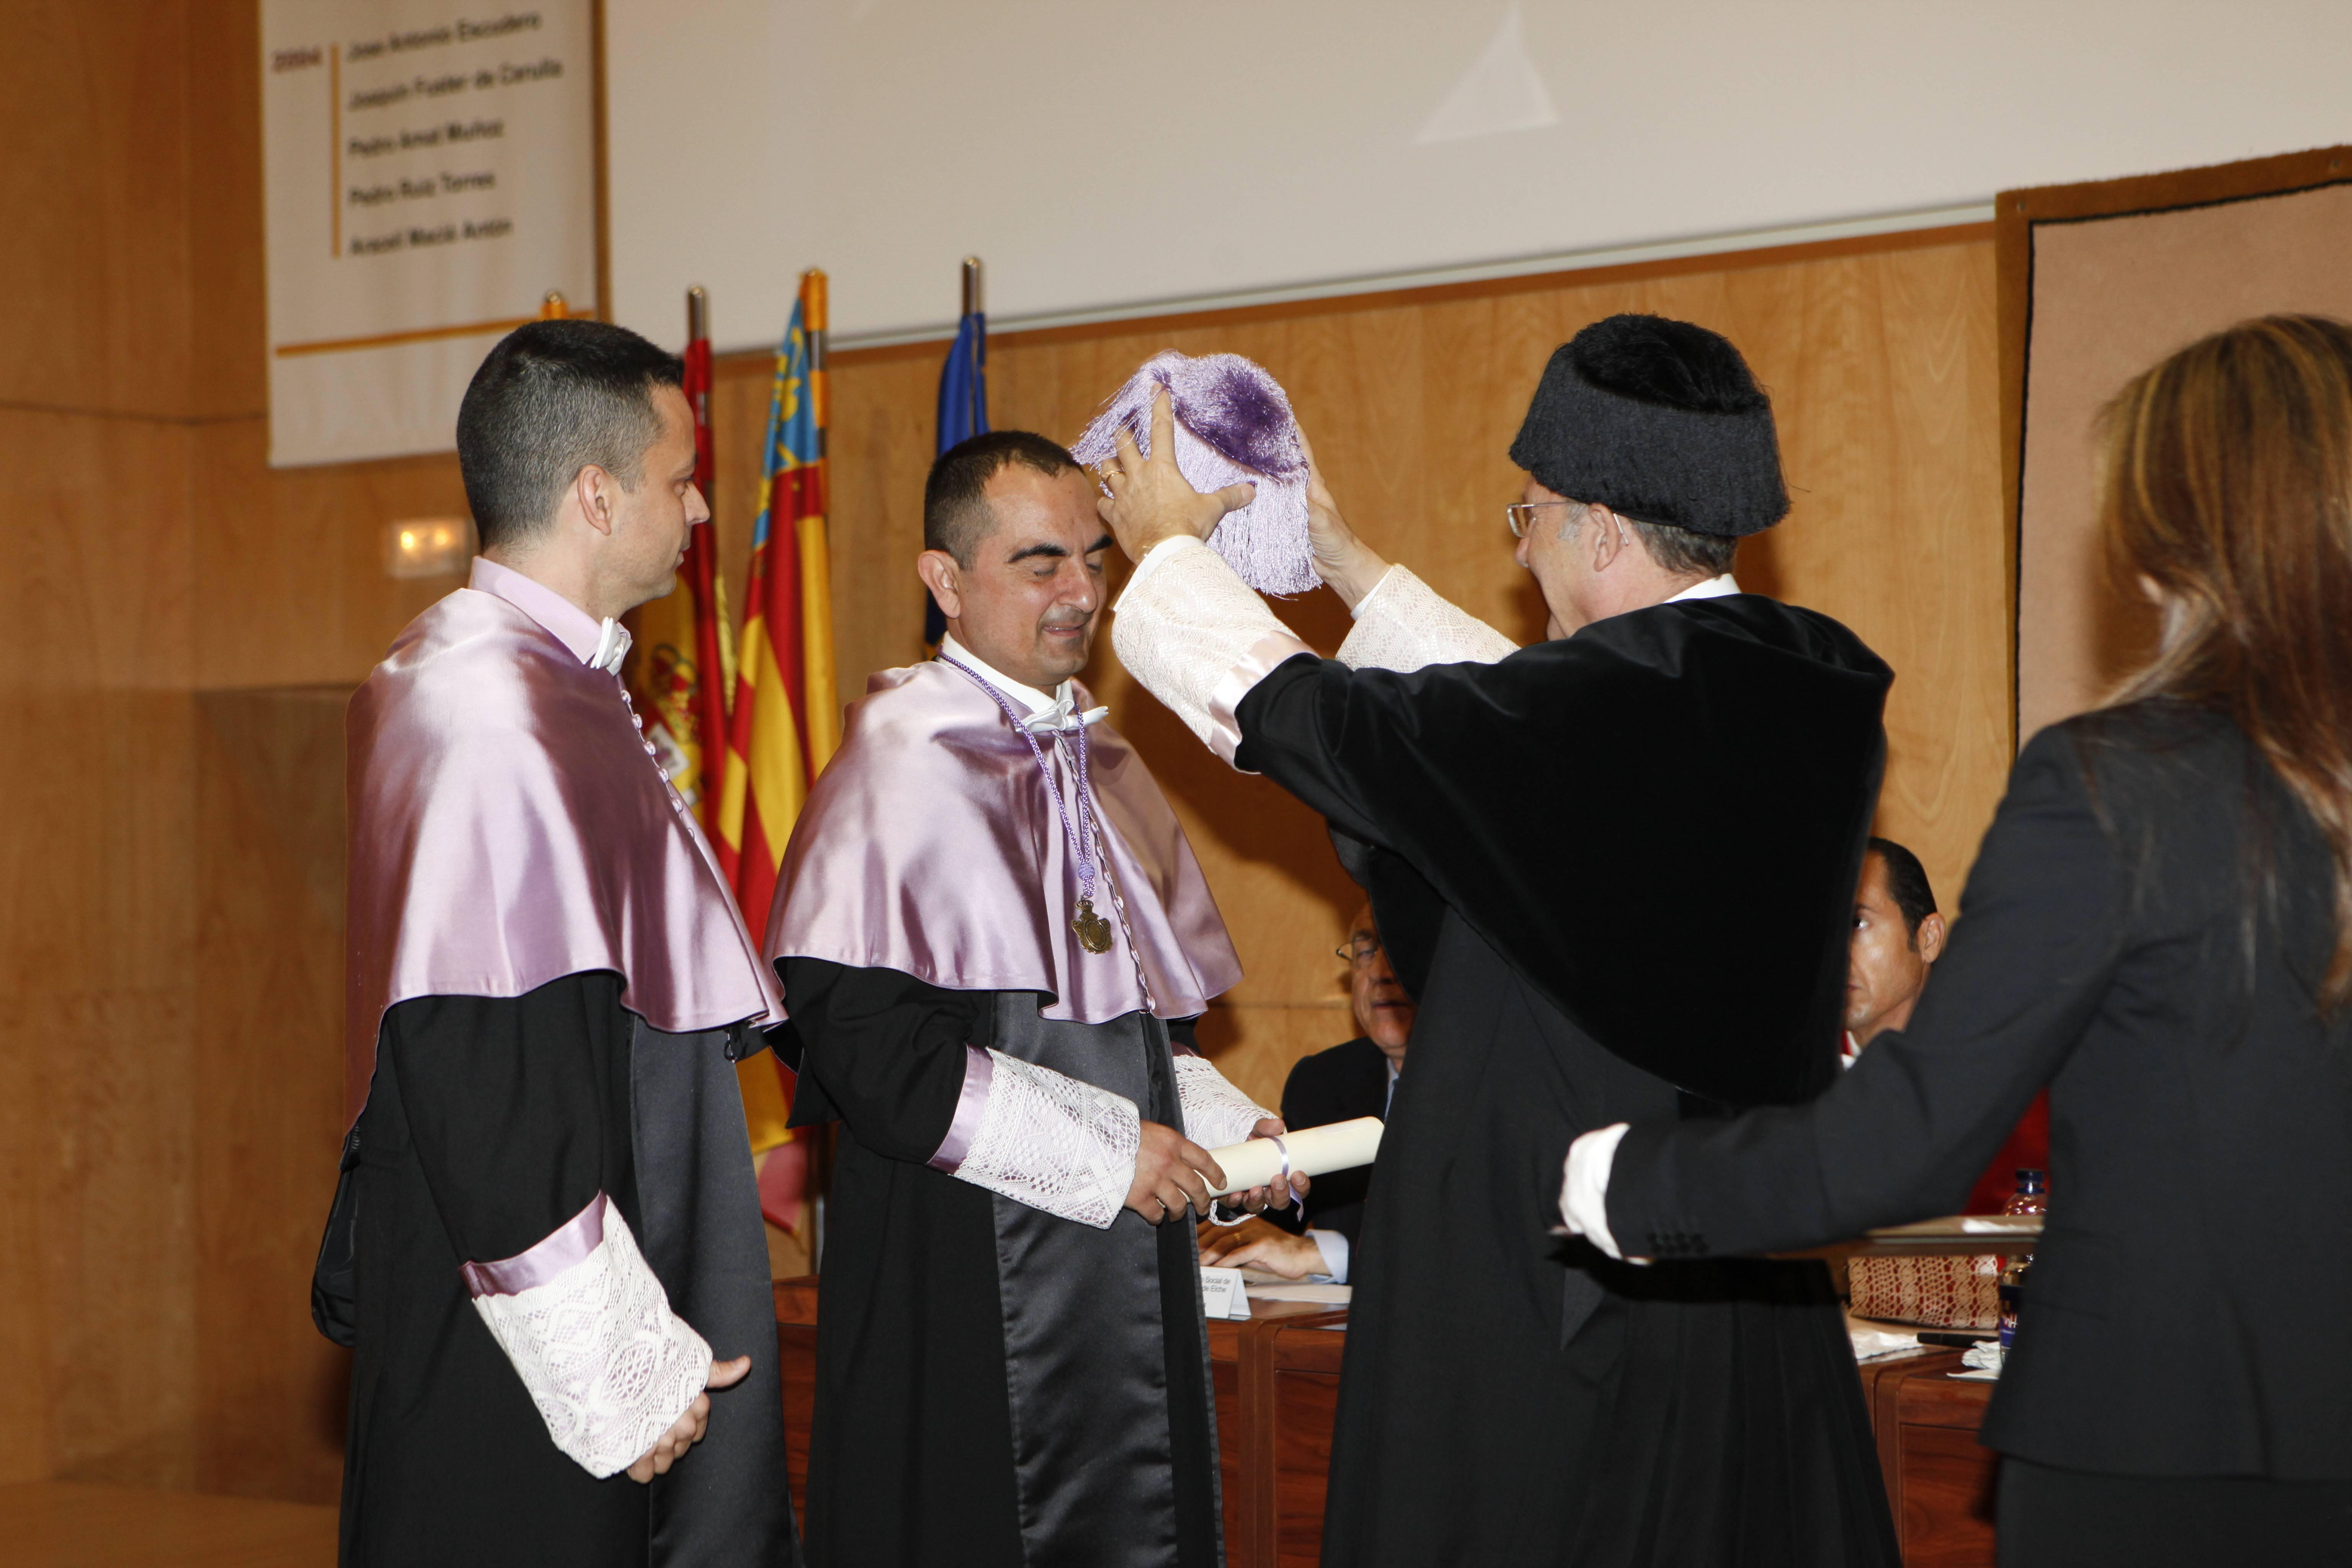 doctor-honoris-causa-luis-gamir_mg_1151.jpg